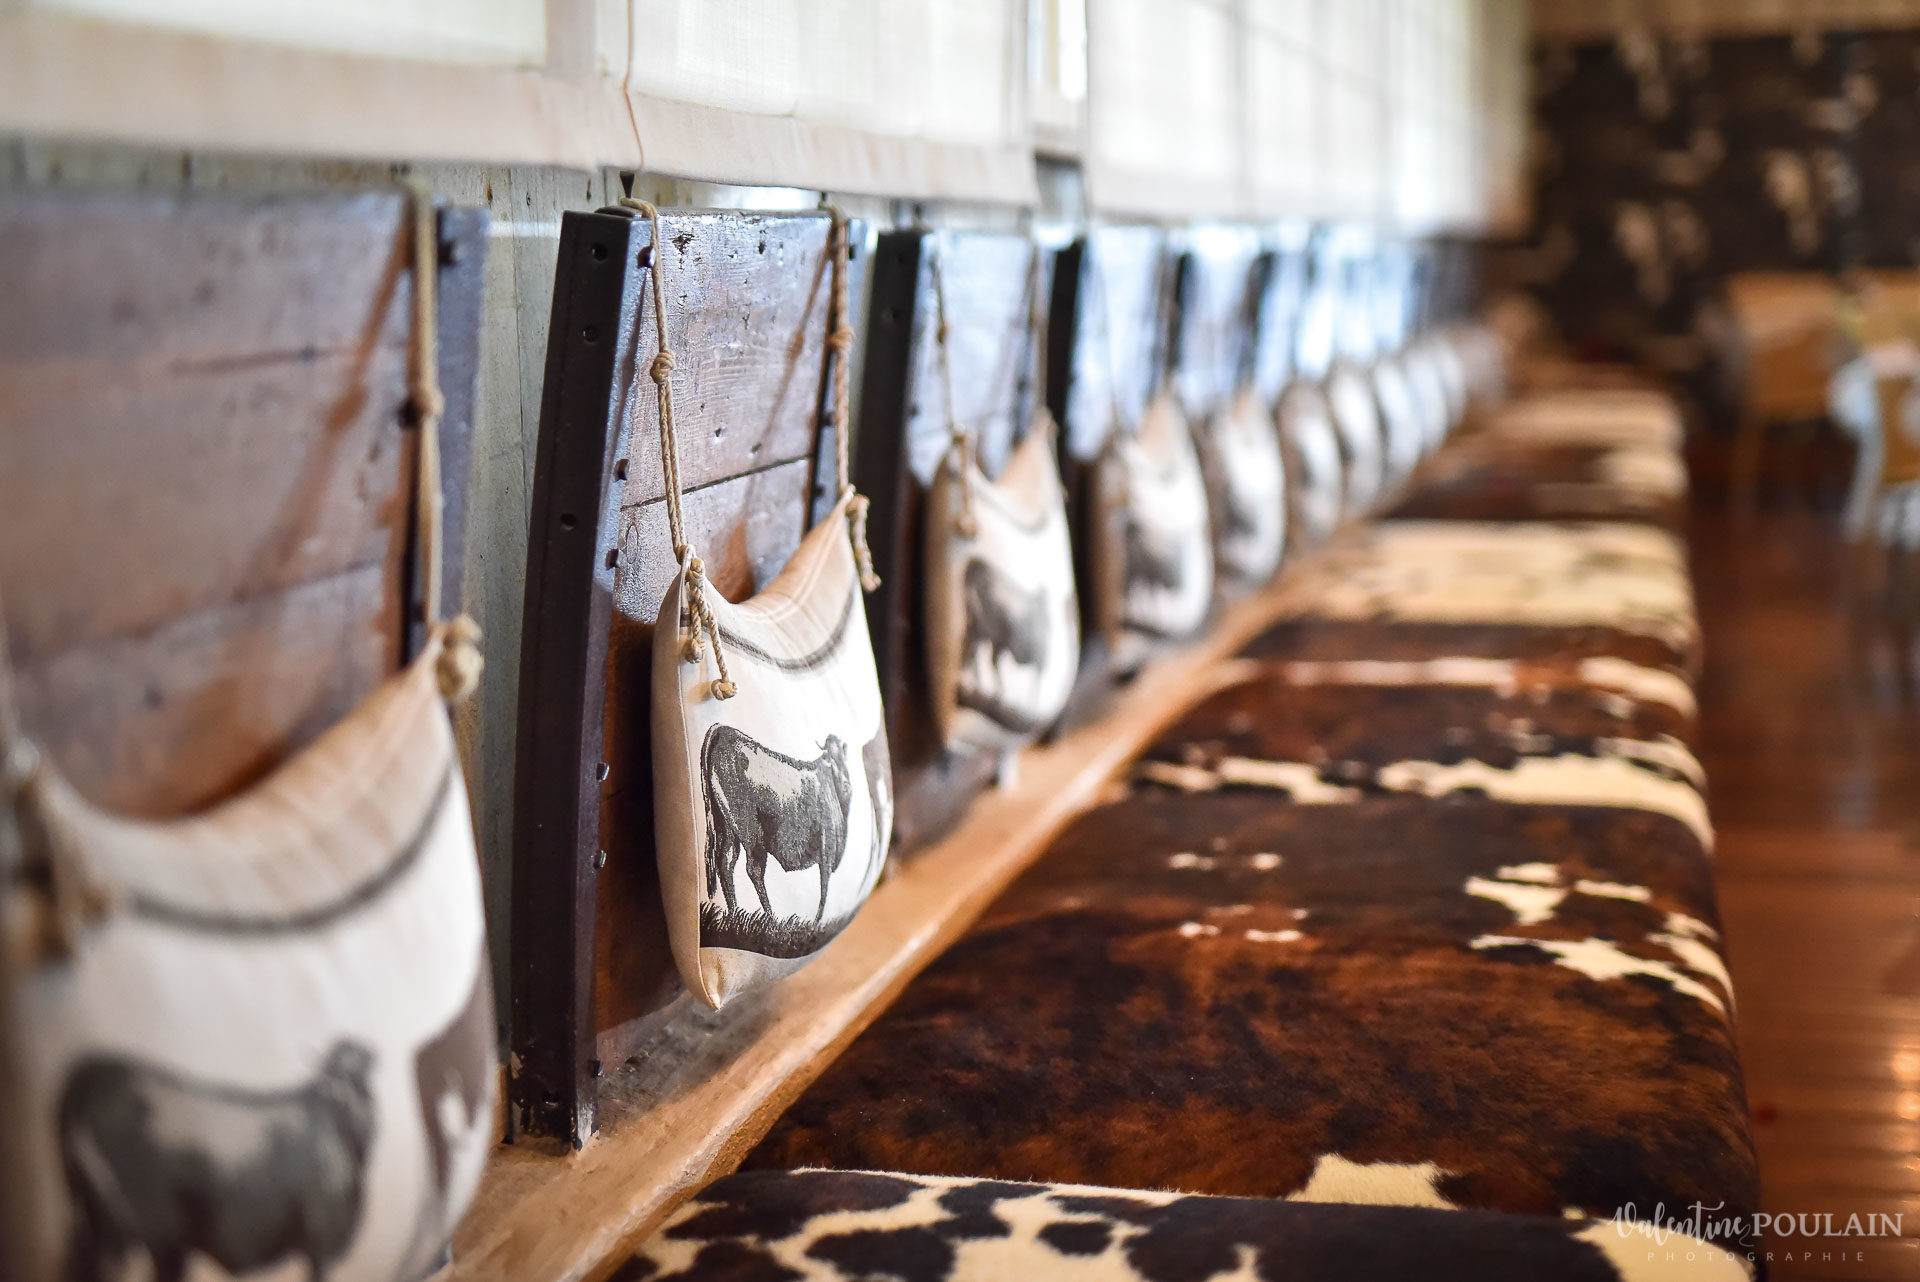 Mariage cool ferme weyerbach - Valentine Poulain bancs